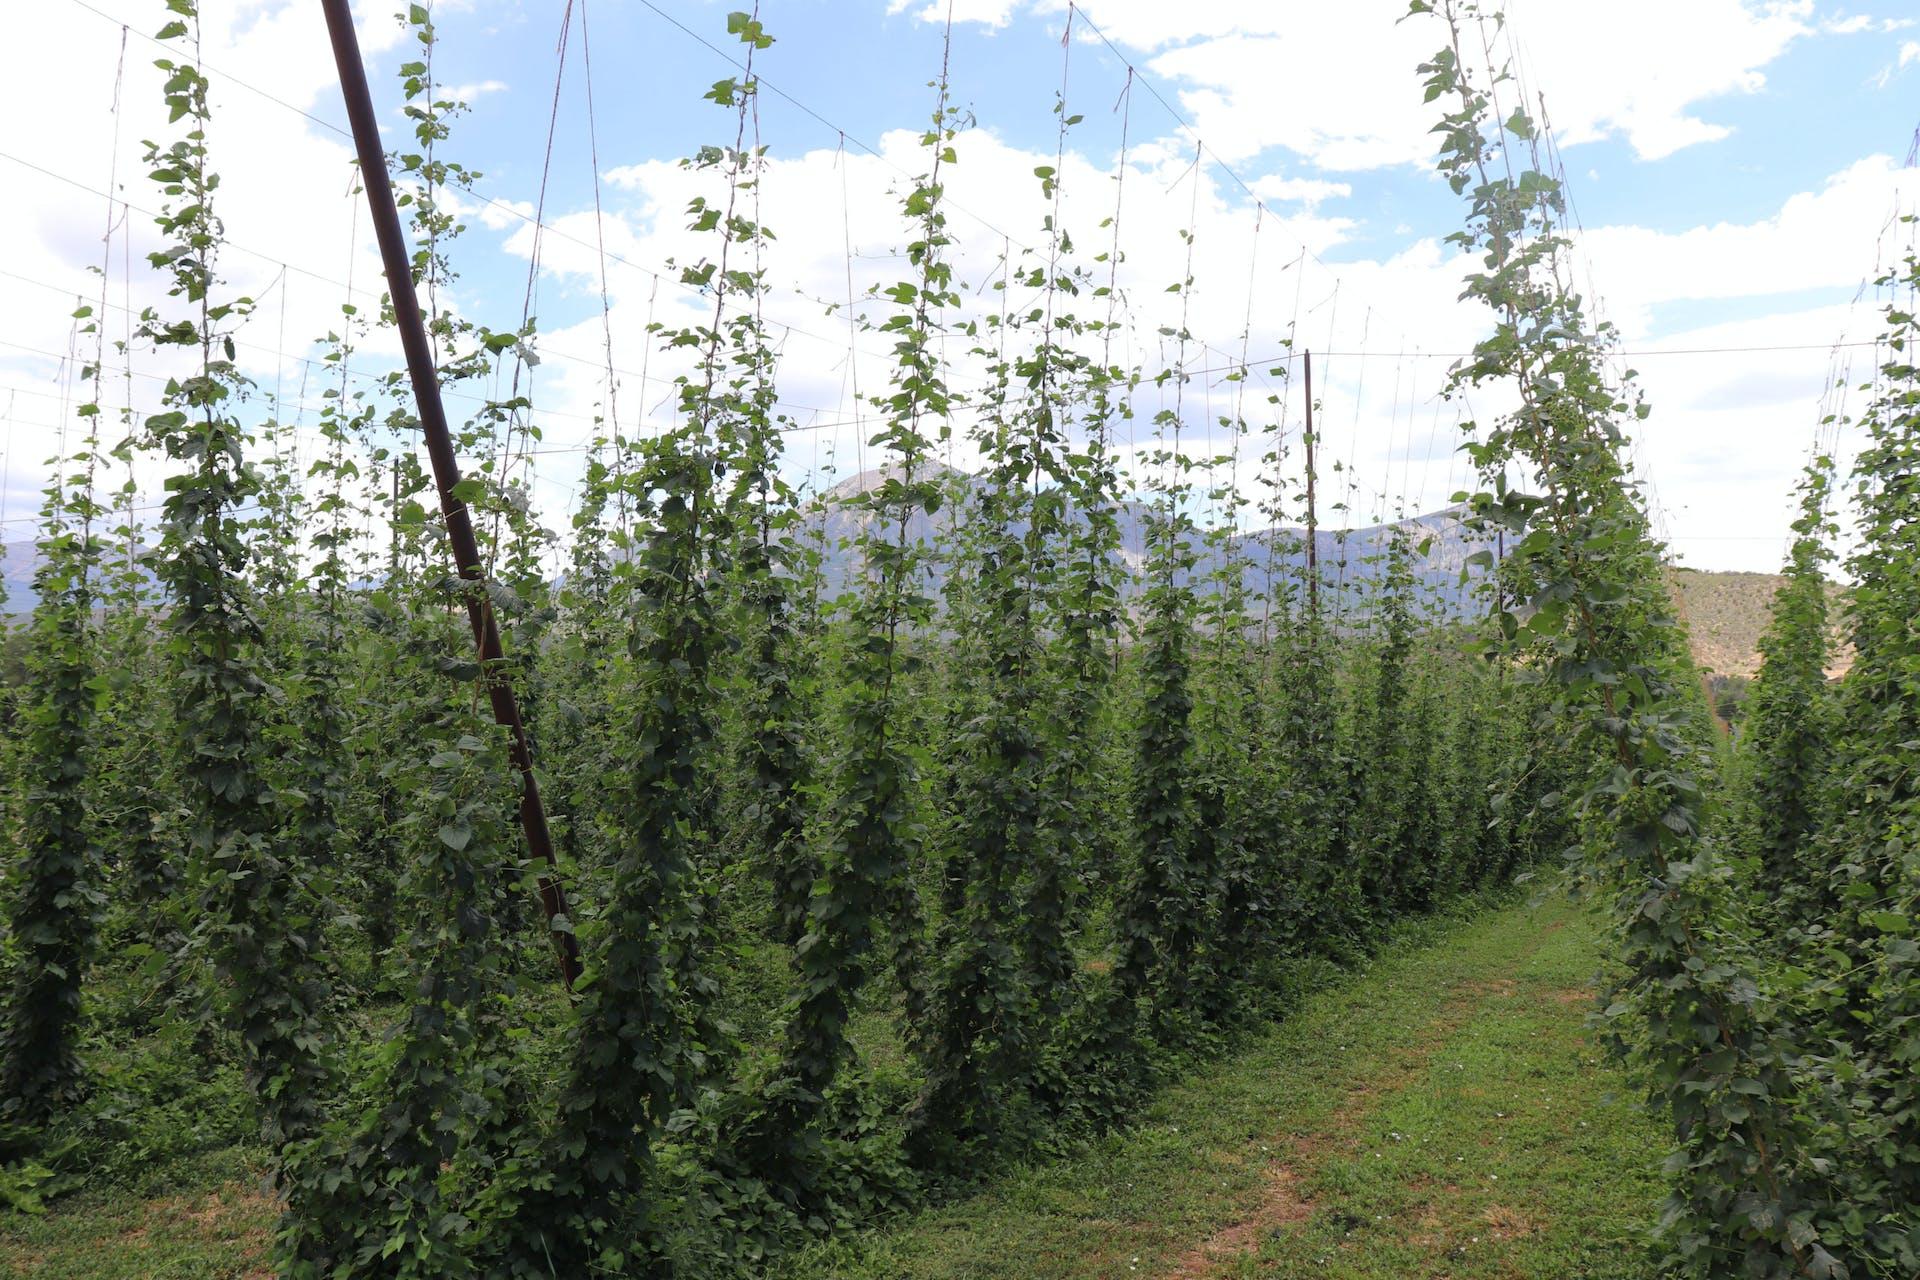 High Wire Hops Farm